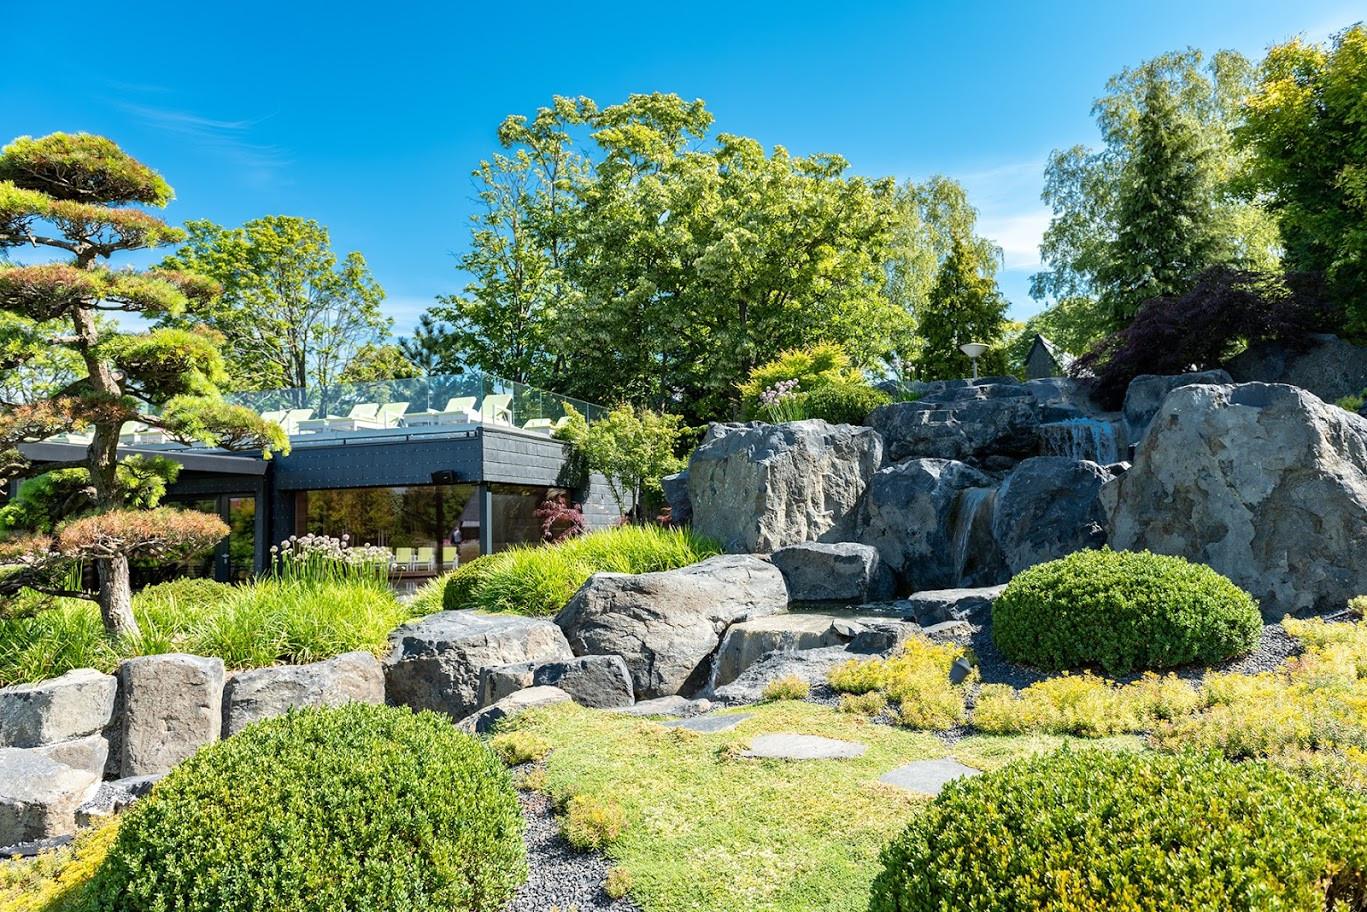 Zen Garden Resort szaunaház / sauna  house